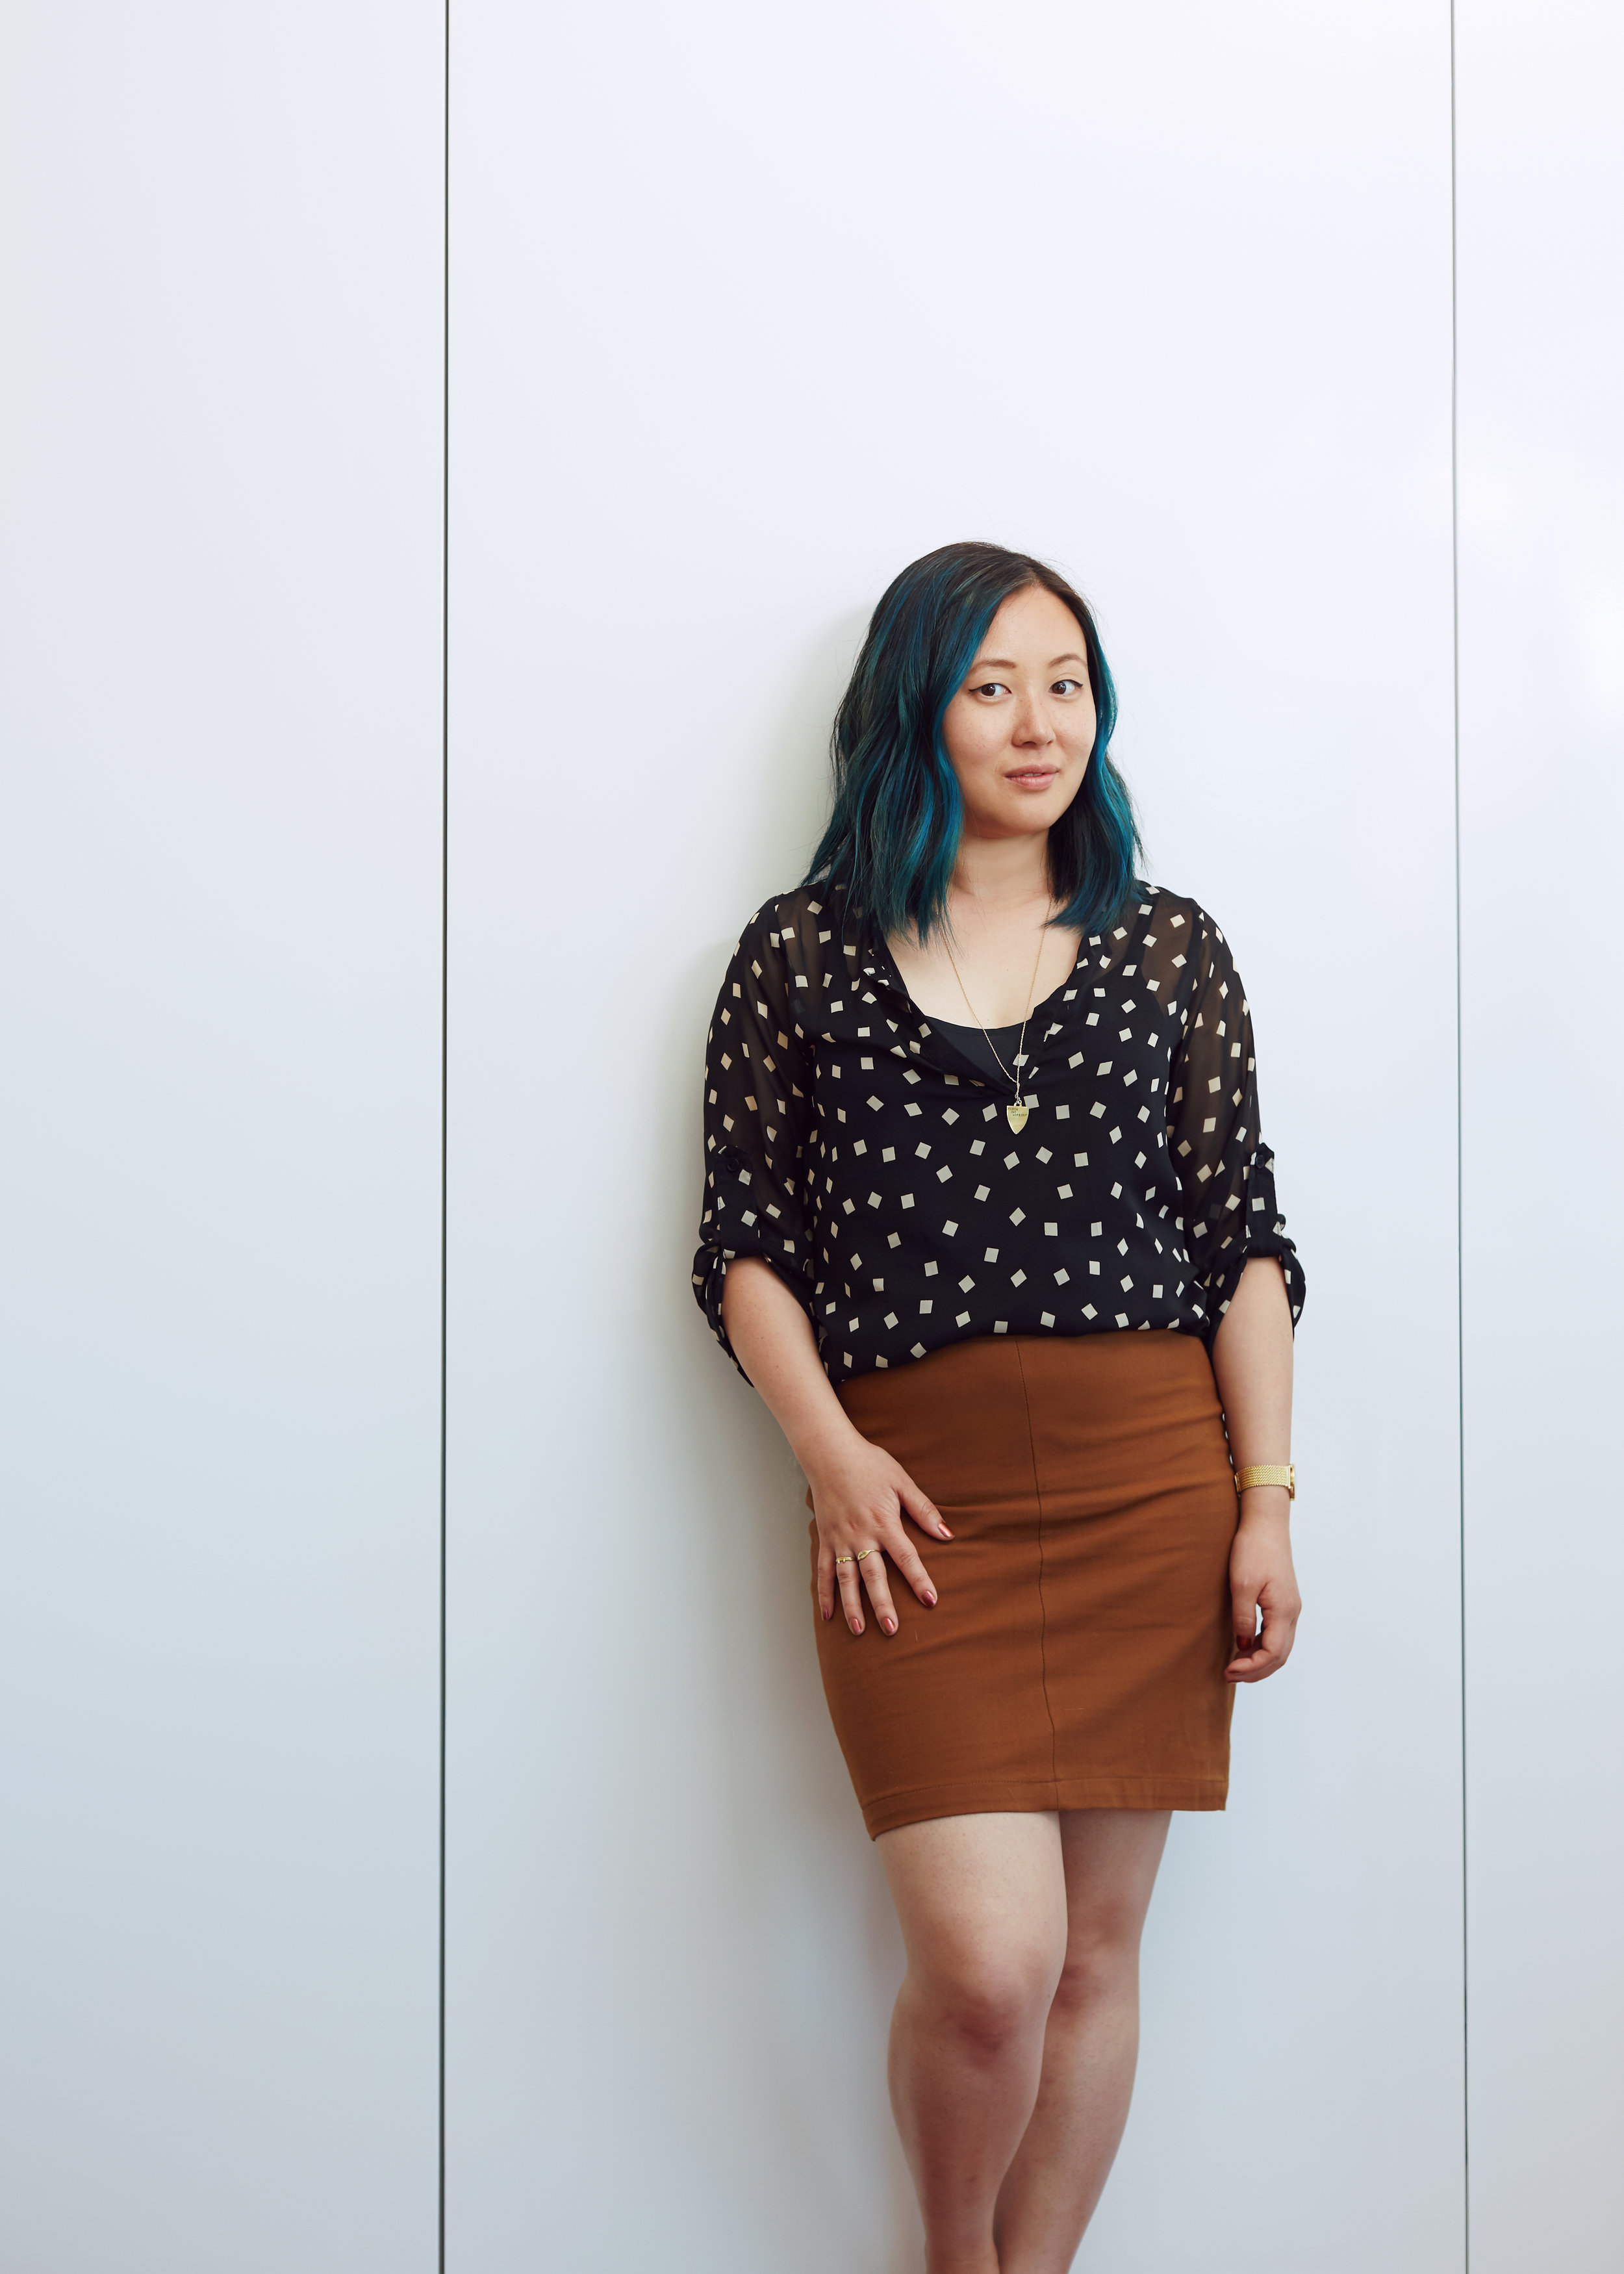 Ash Huang - 2017.07.21 - Personal Portrait - 219.jpg